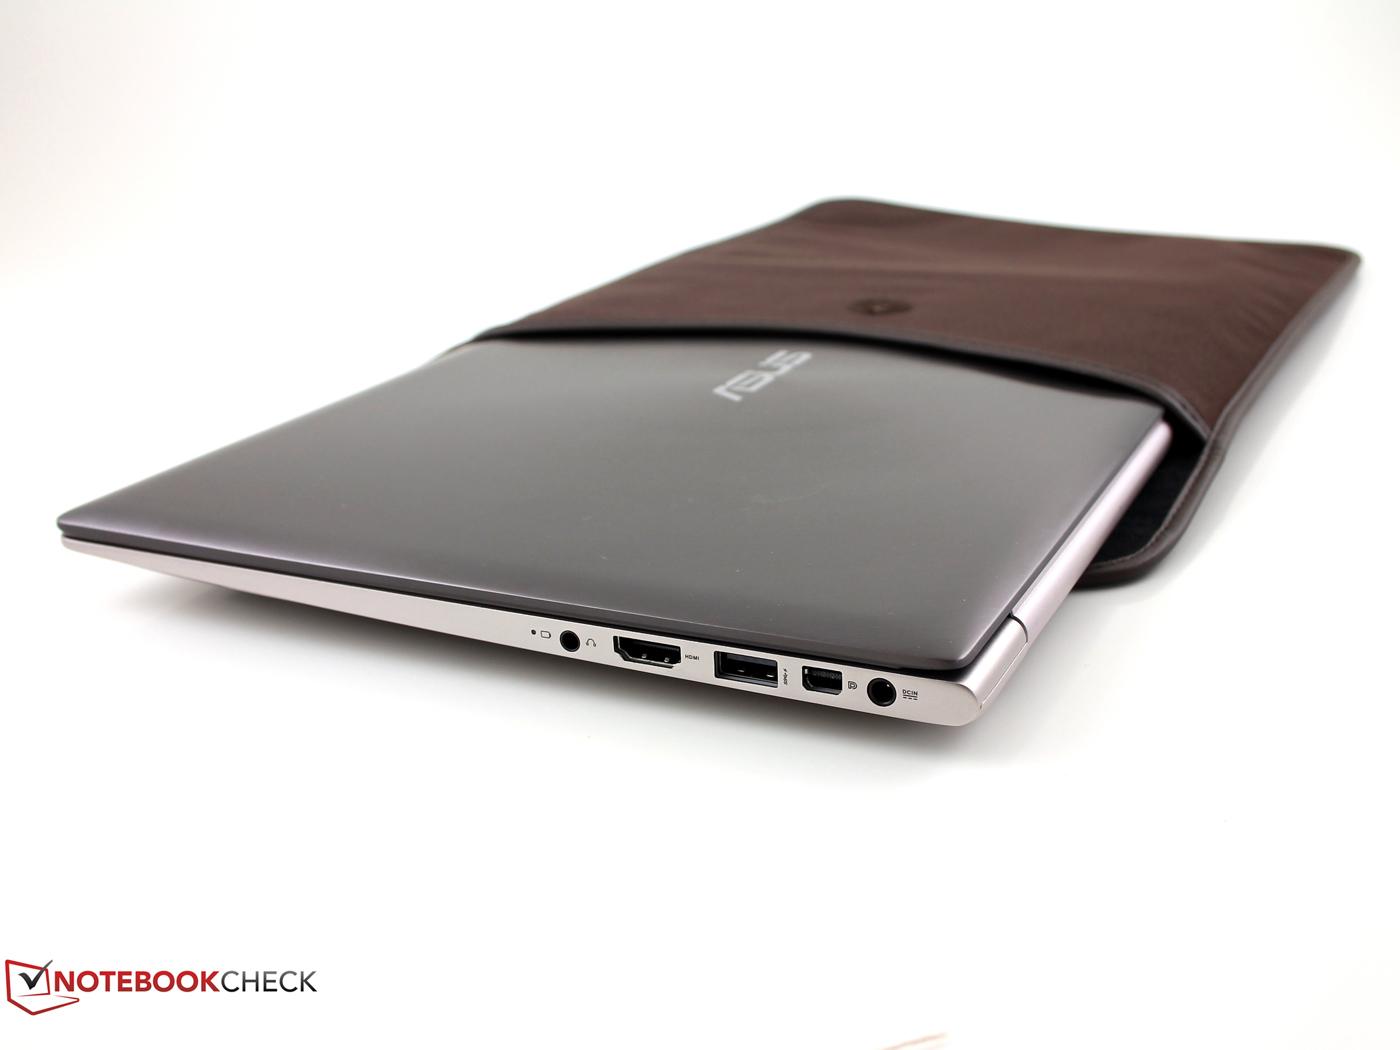 Asus Zenbook Ux303ub Core I7 6500u Geforce 940m